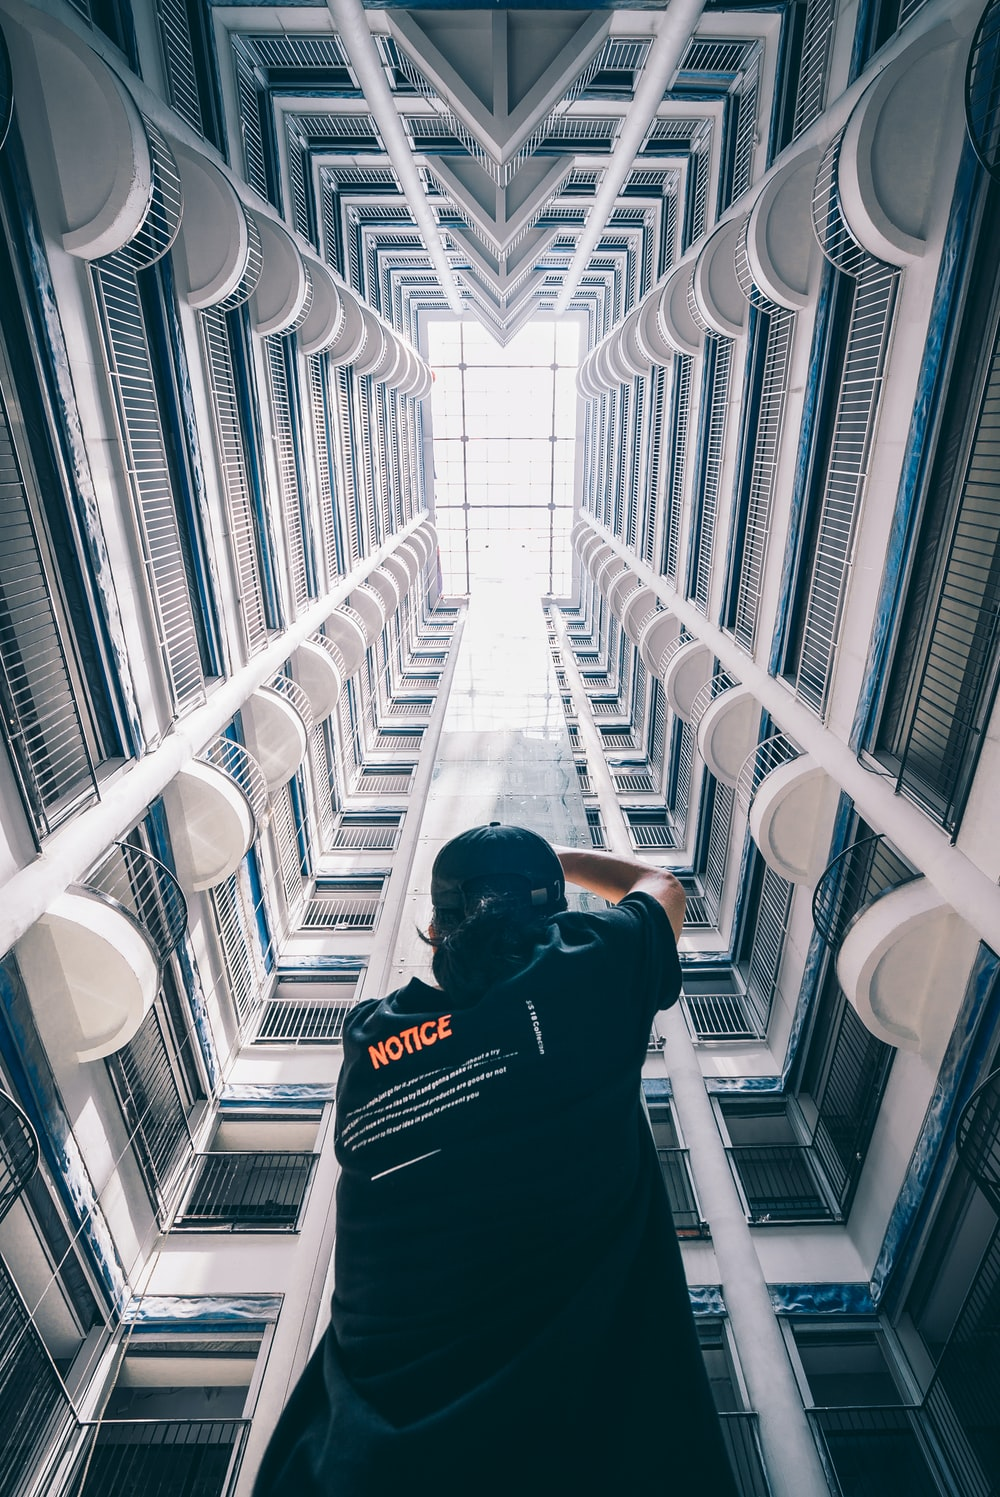 man in black T-shirt standing inside building